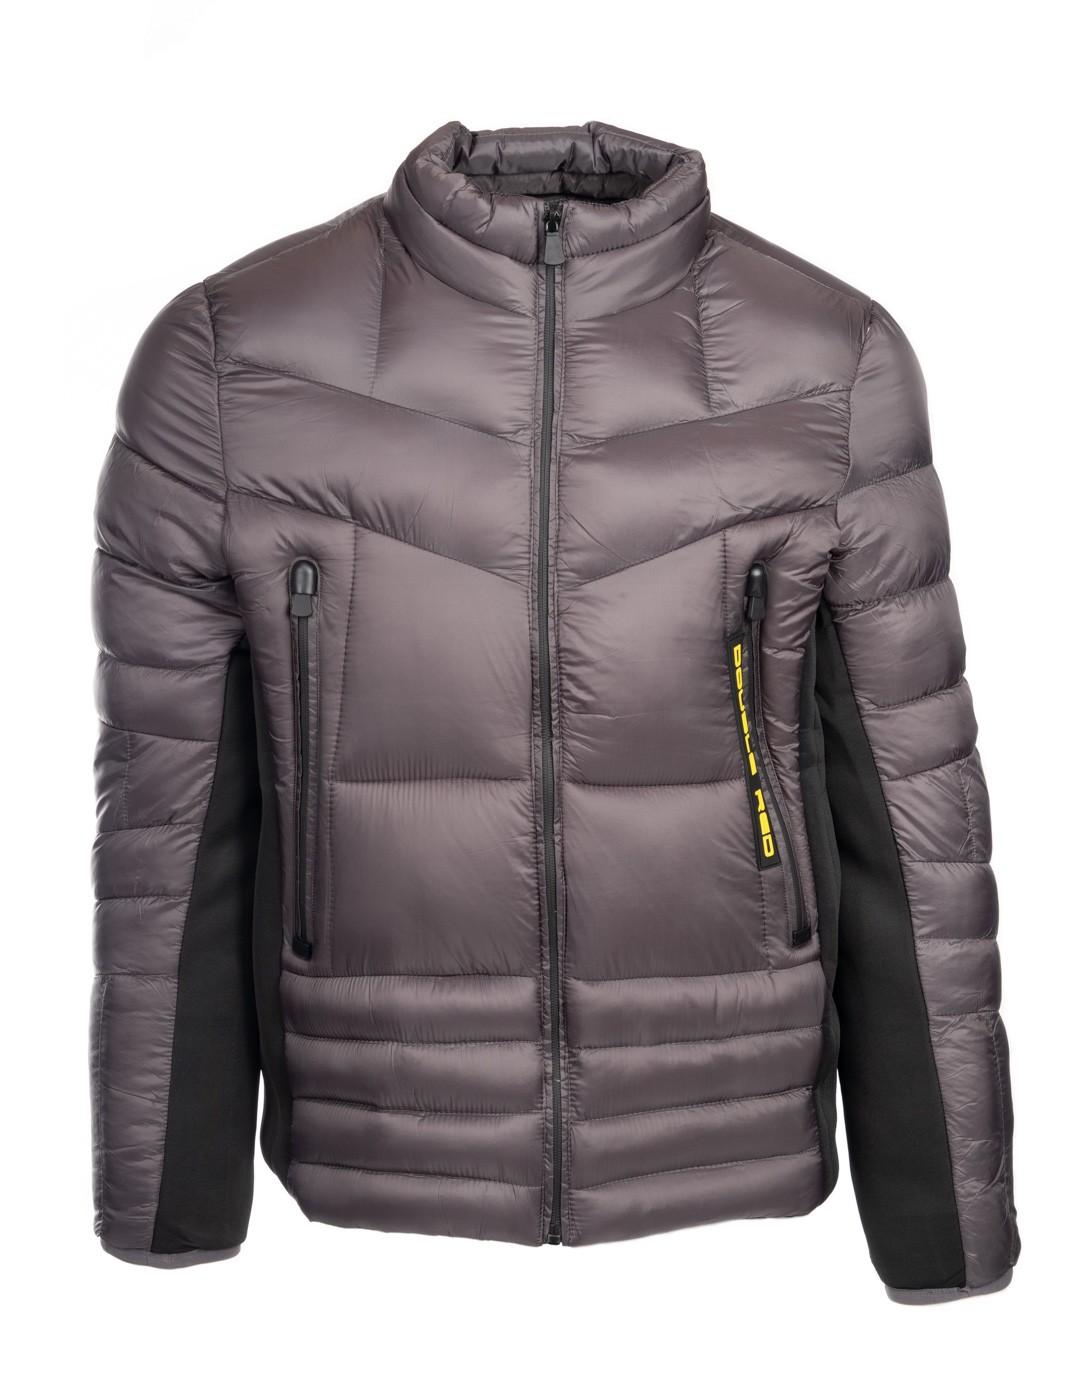 VAL THORENS Jacket Grey